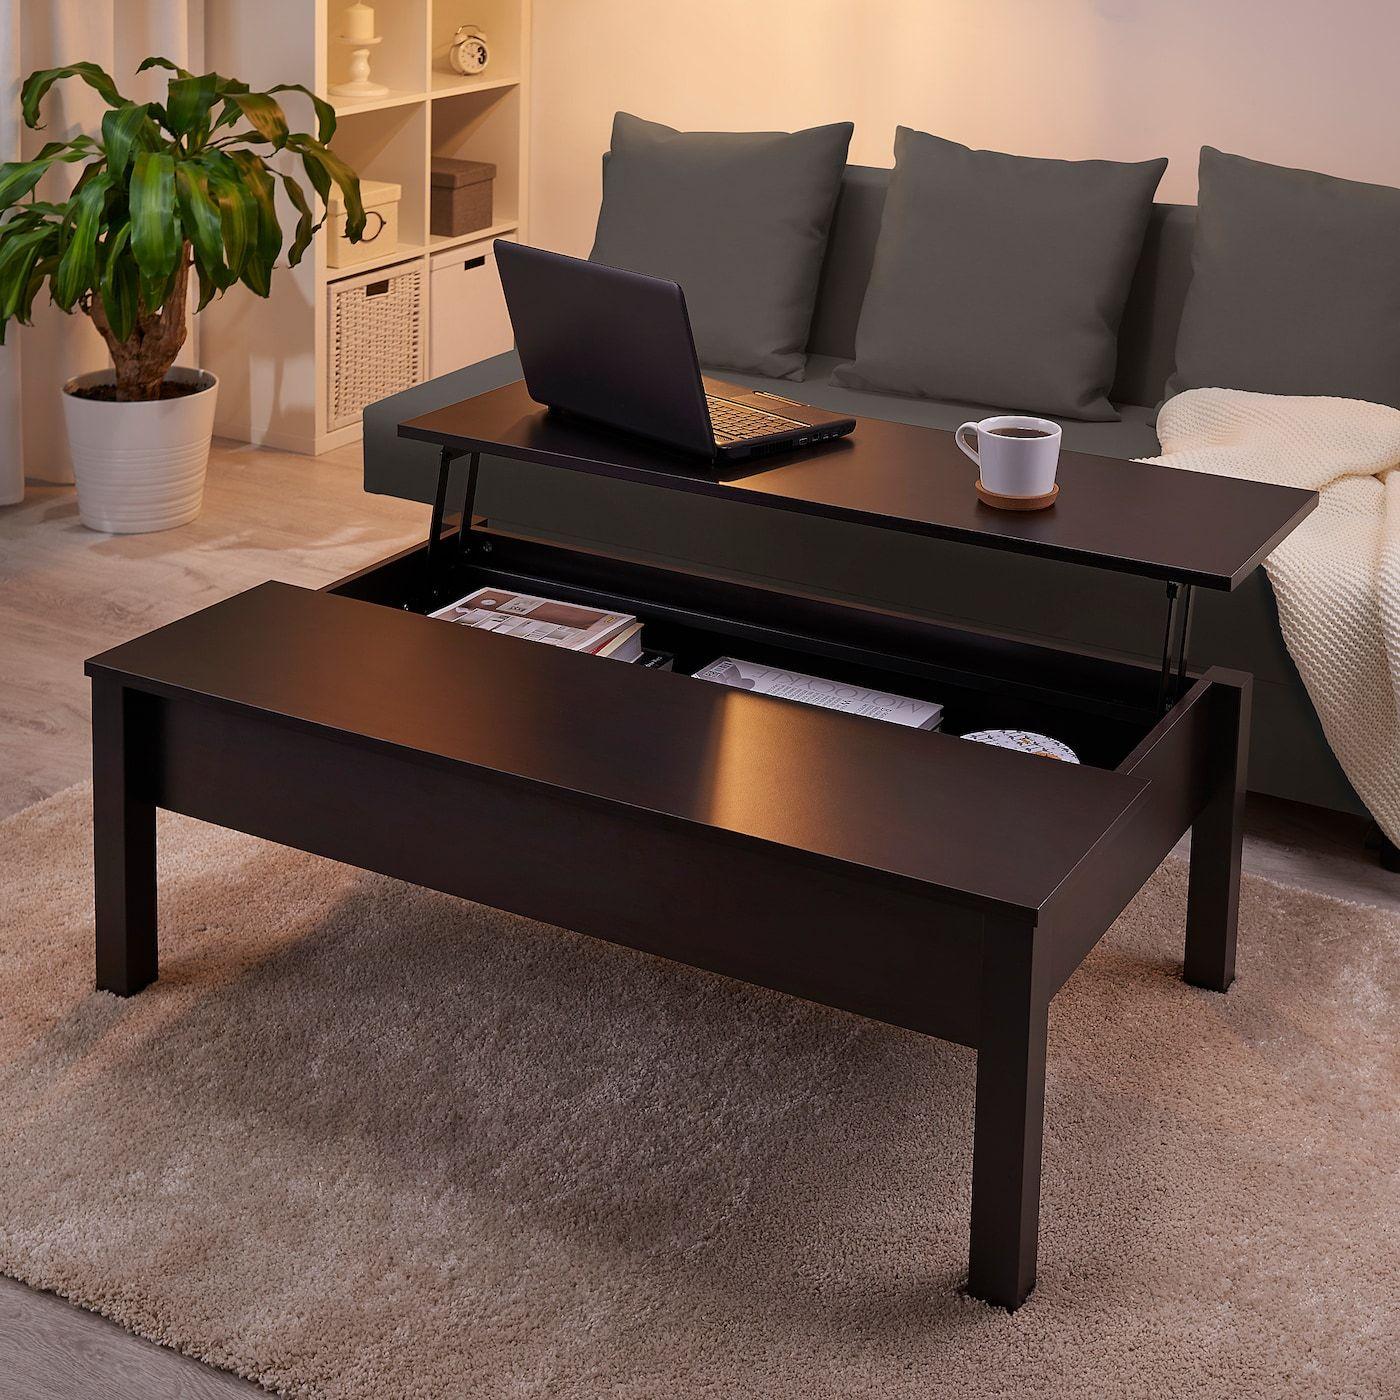 trulstorp coffee table  blackbrown  ikea  the new